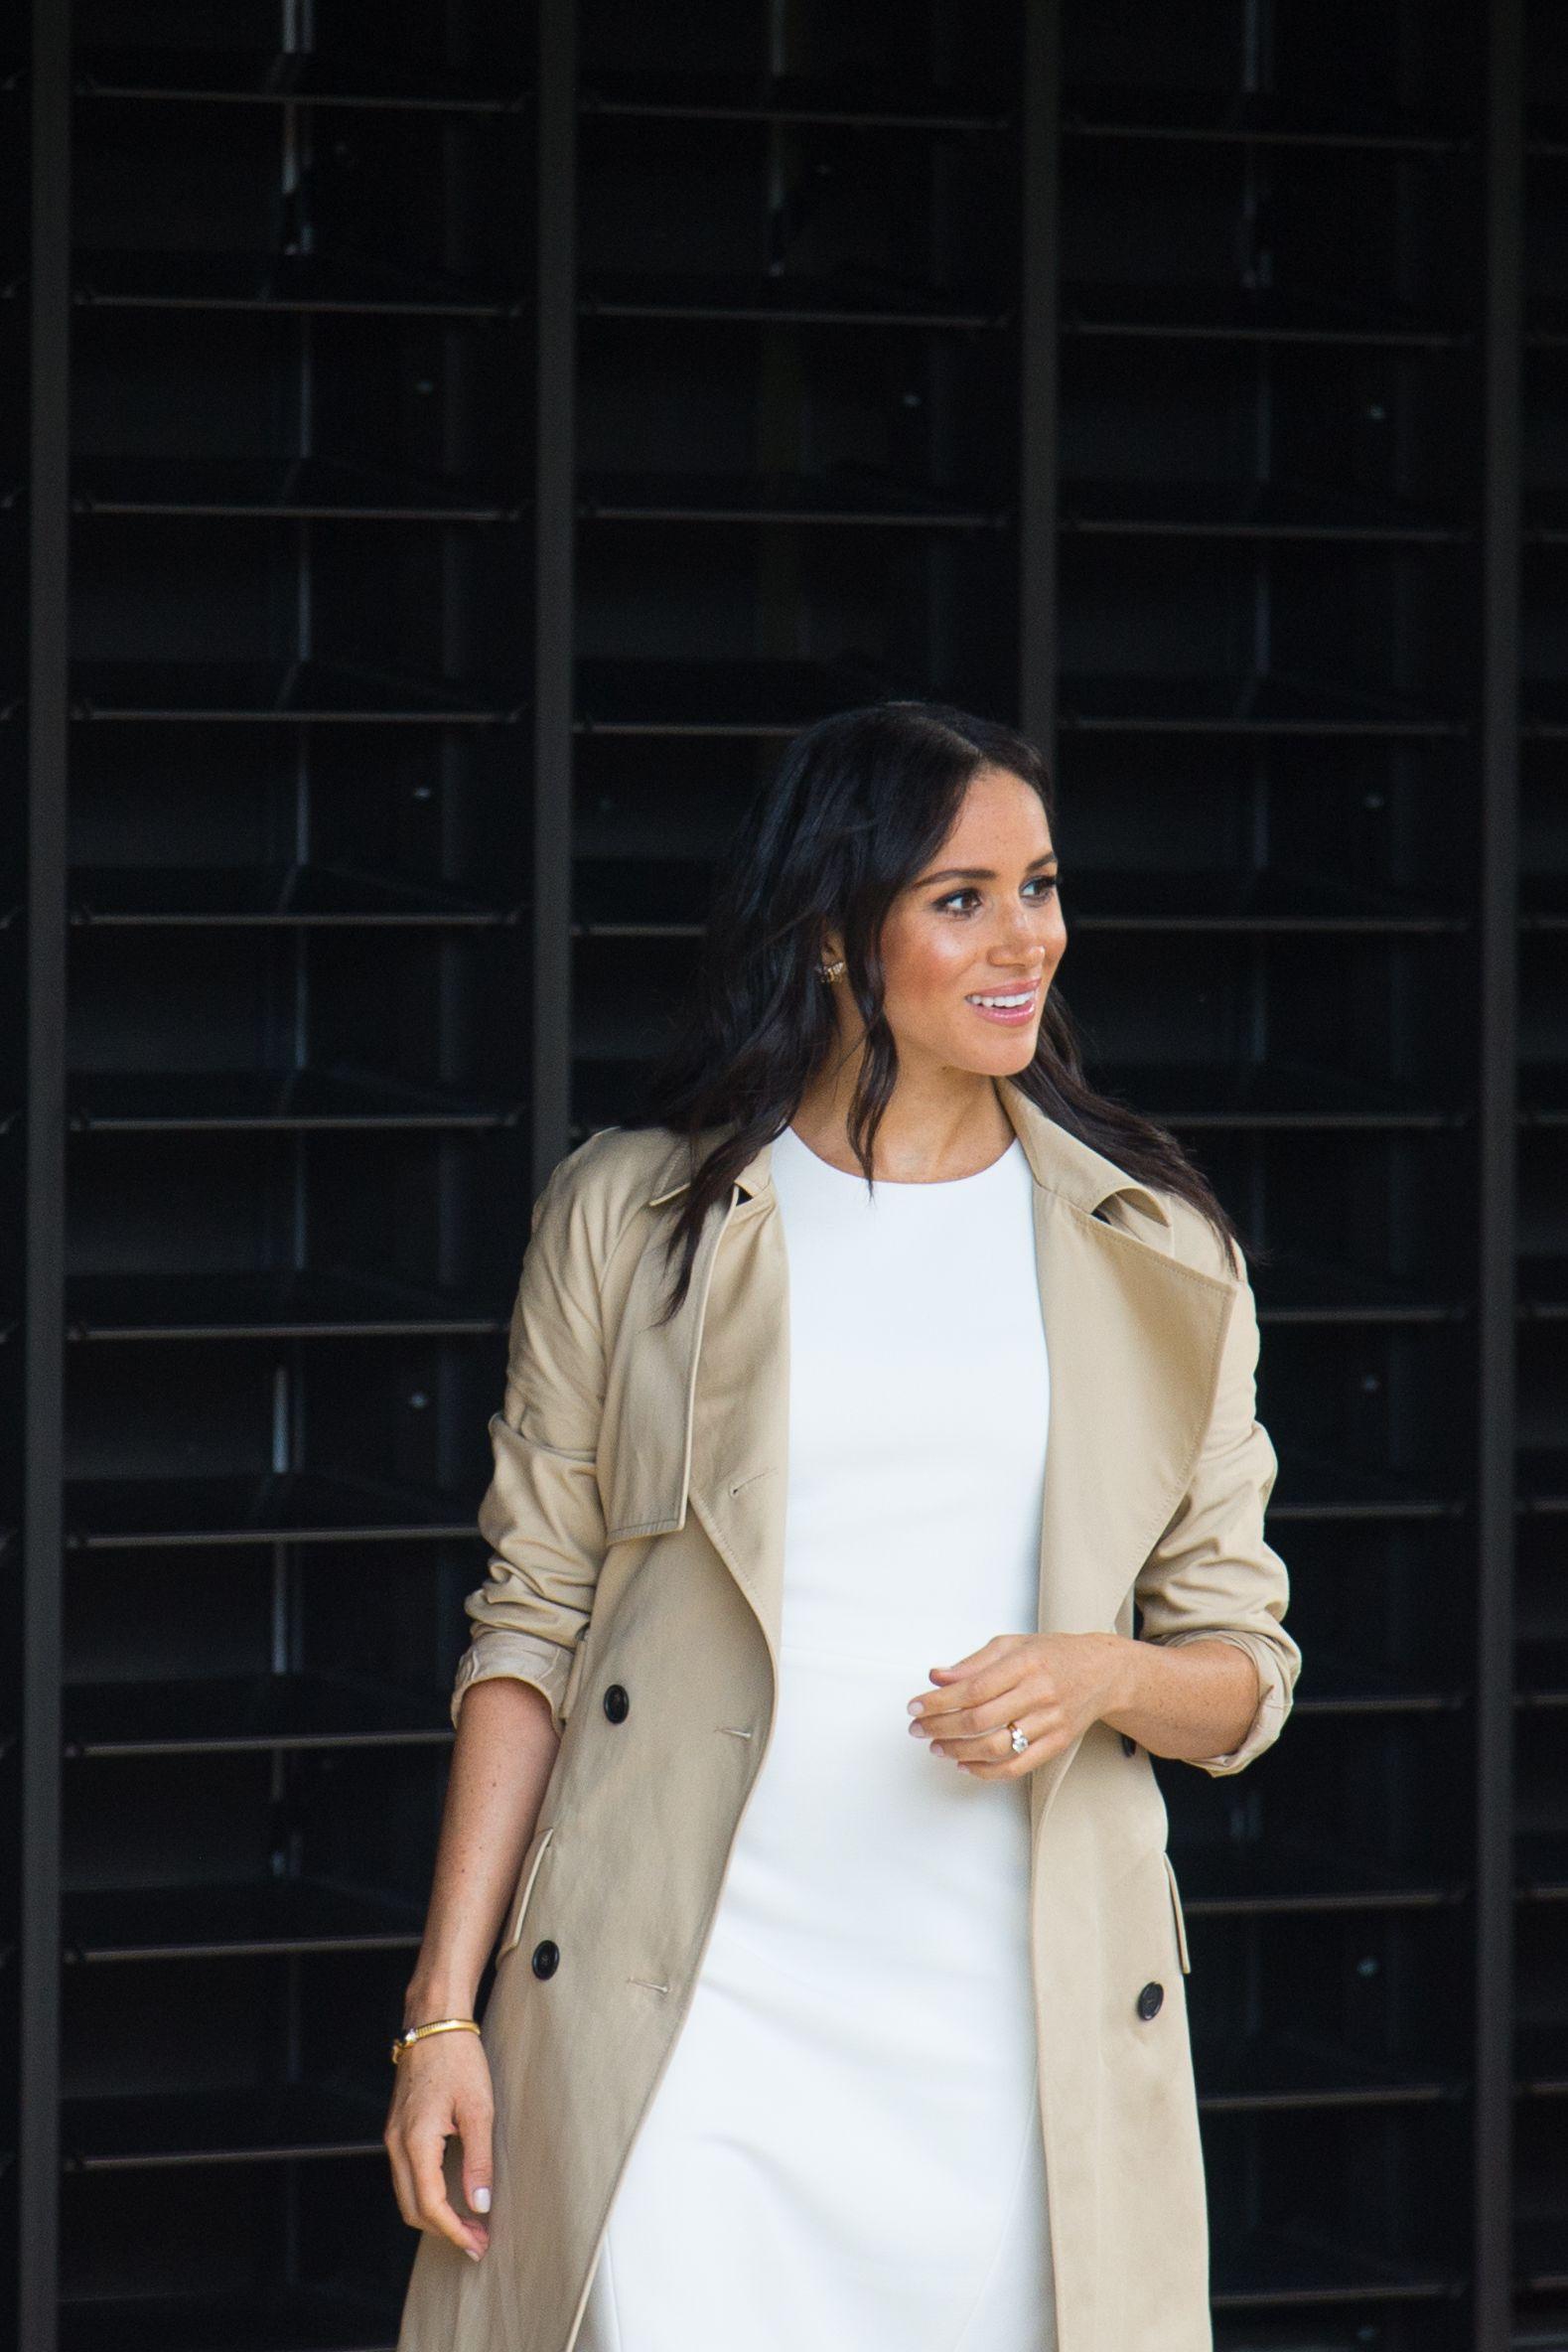 Meghan Markle usa look que salienta barriguinha após anunciar gravidez